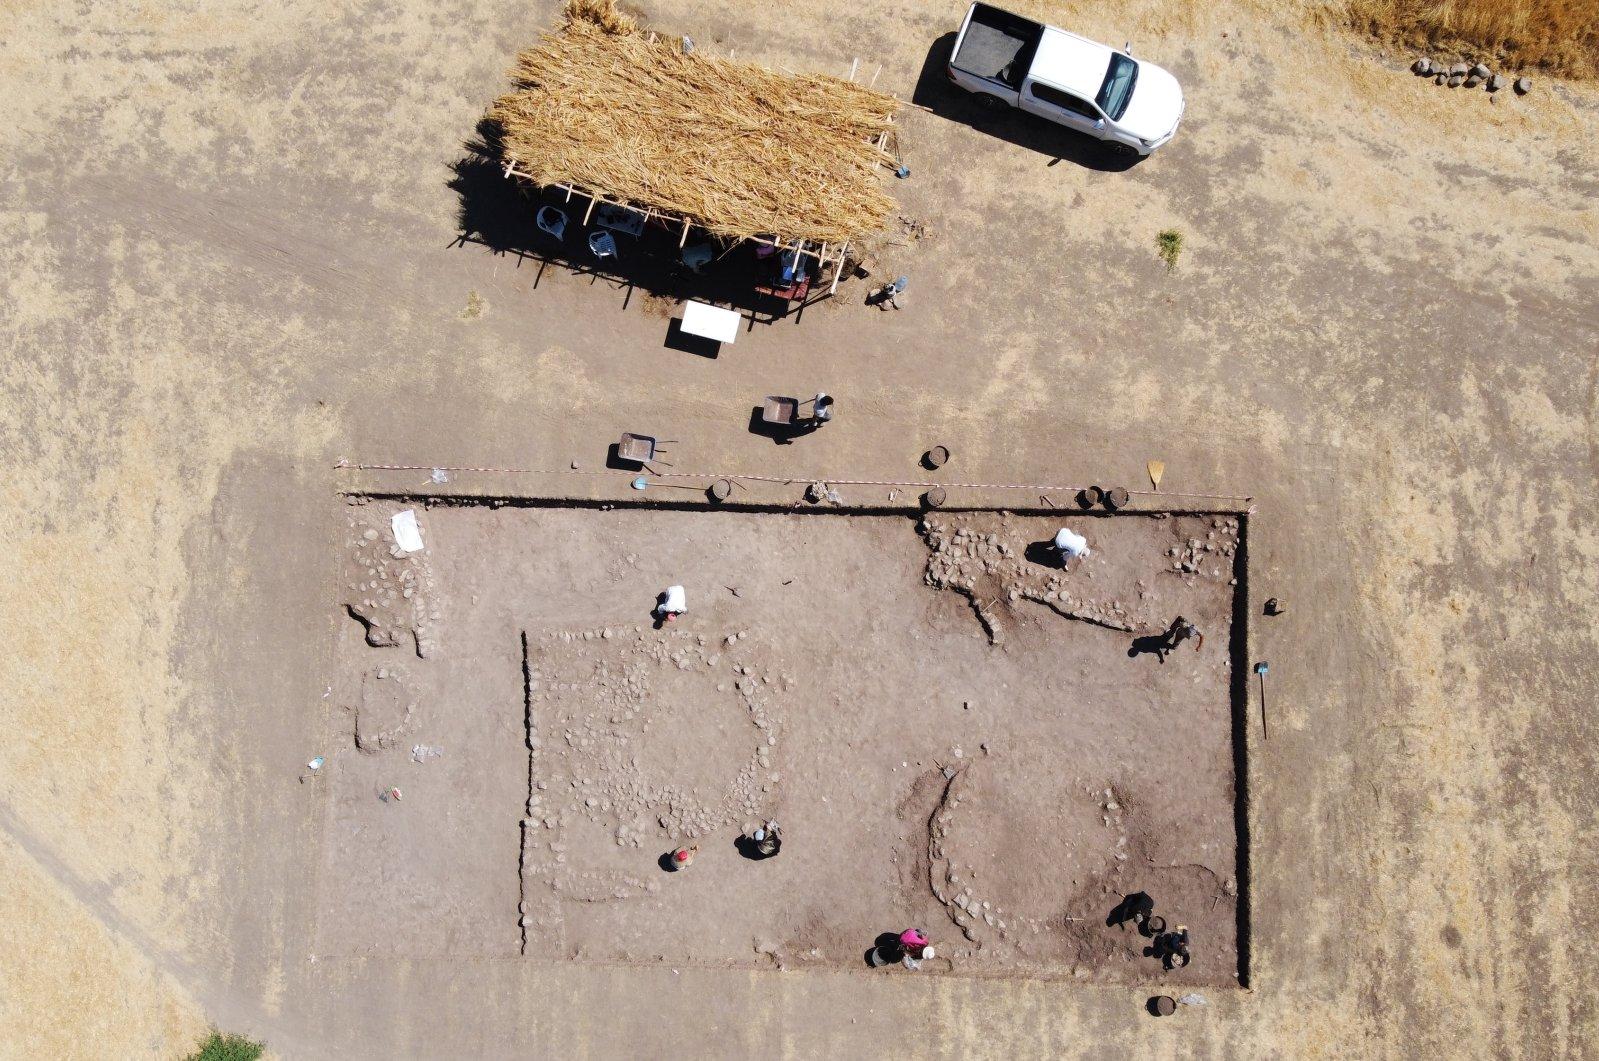 Archaeologists work on the settlement found in Domuztepe Mound, Kahramanmaraş, southern Turkey, Sept. 7, 2021. (AA Photo)